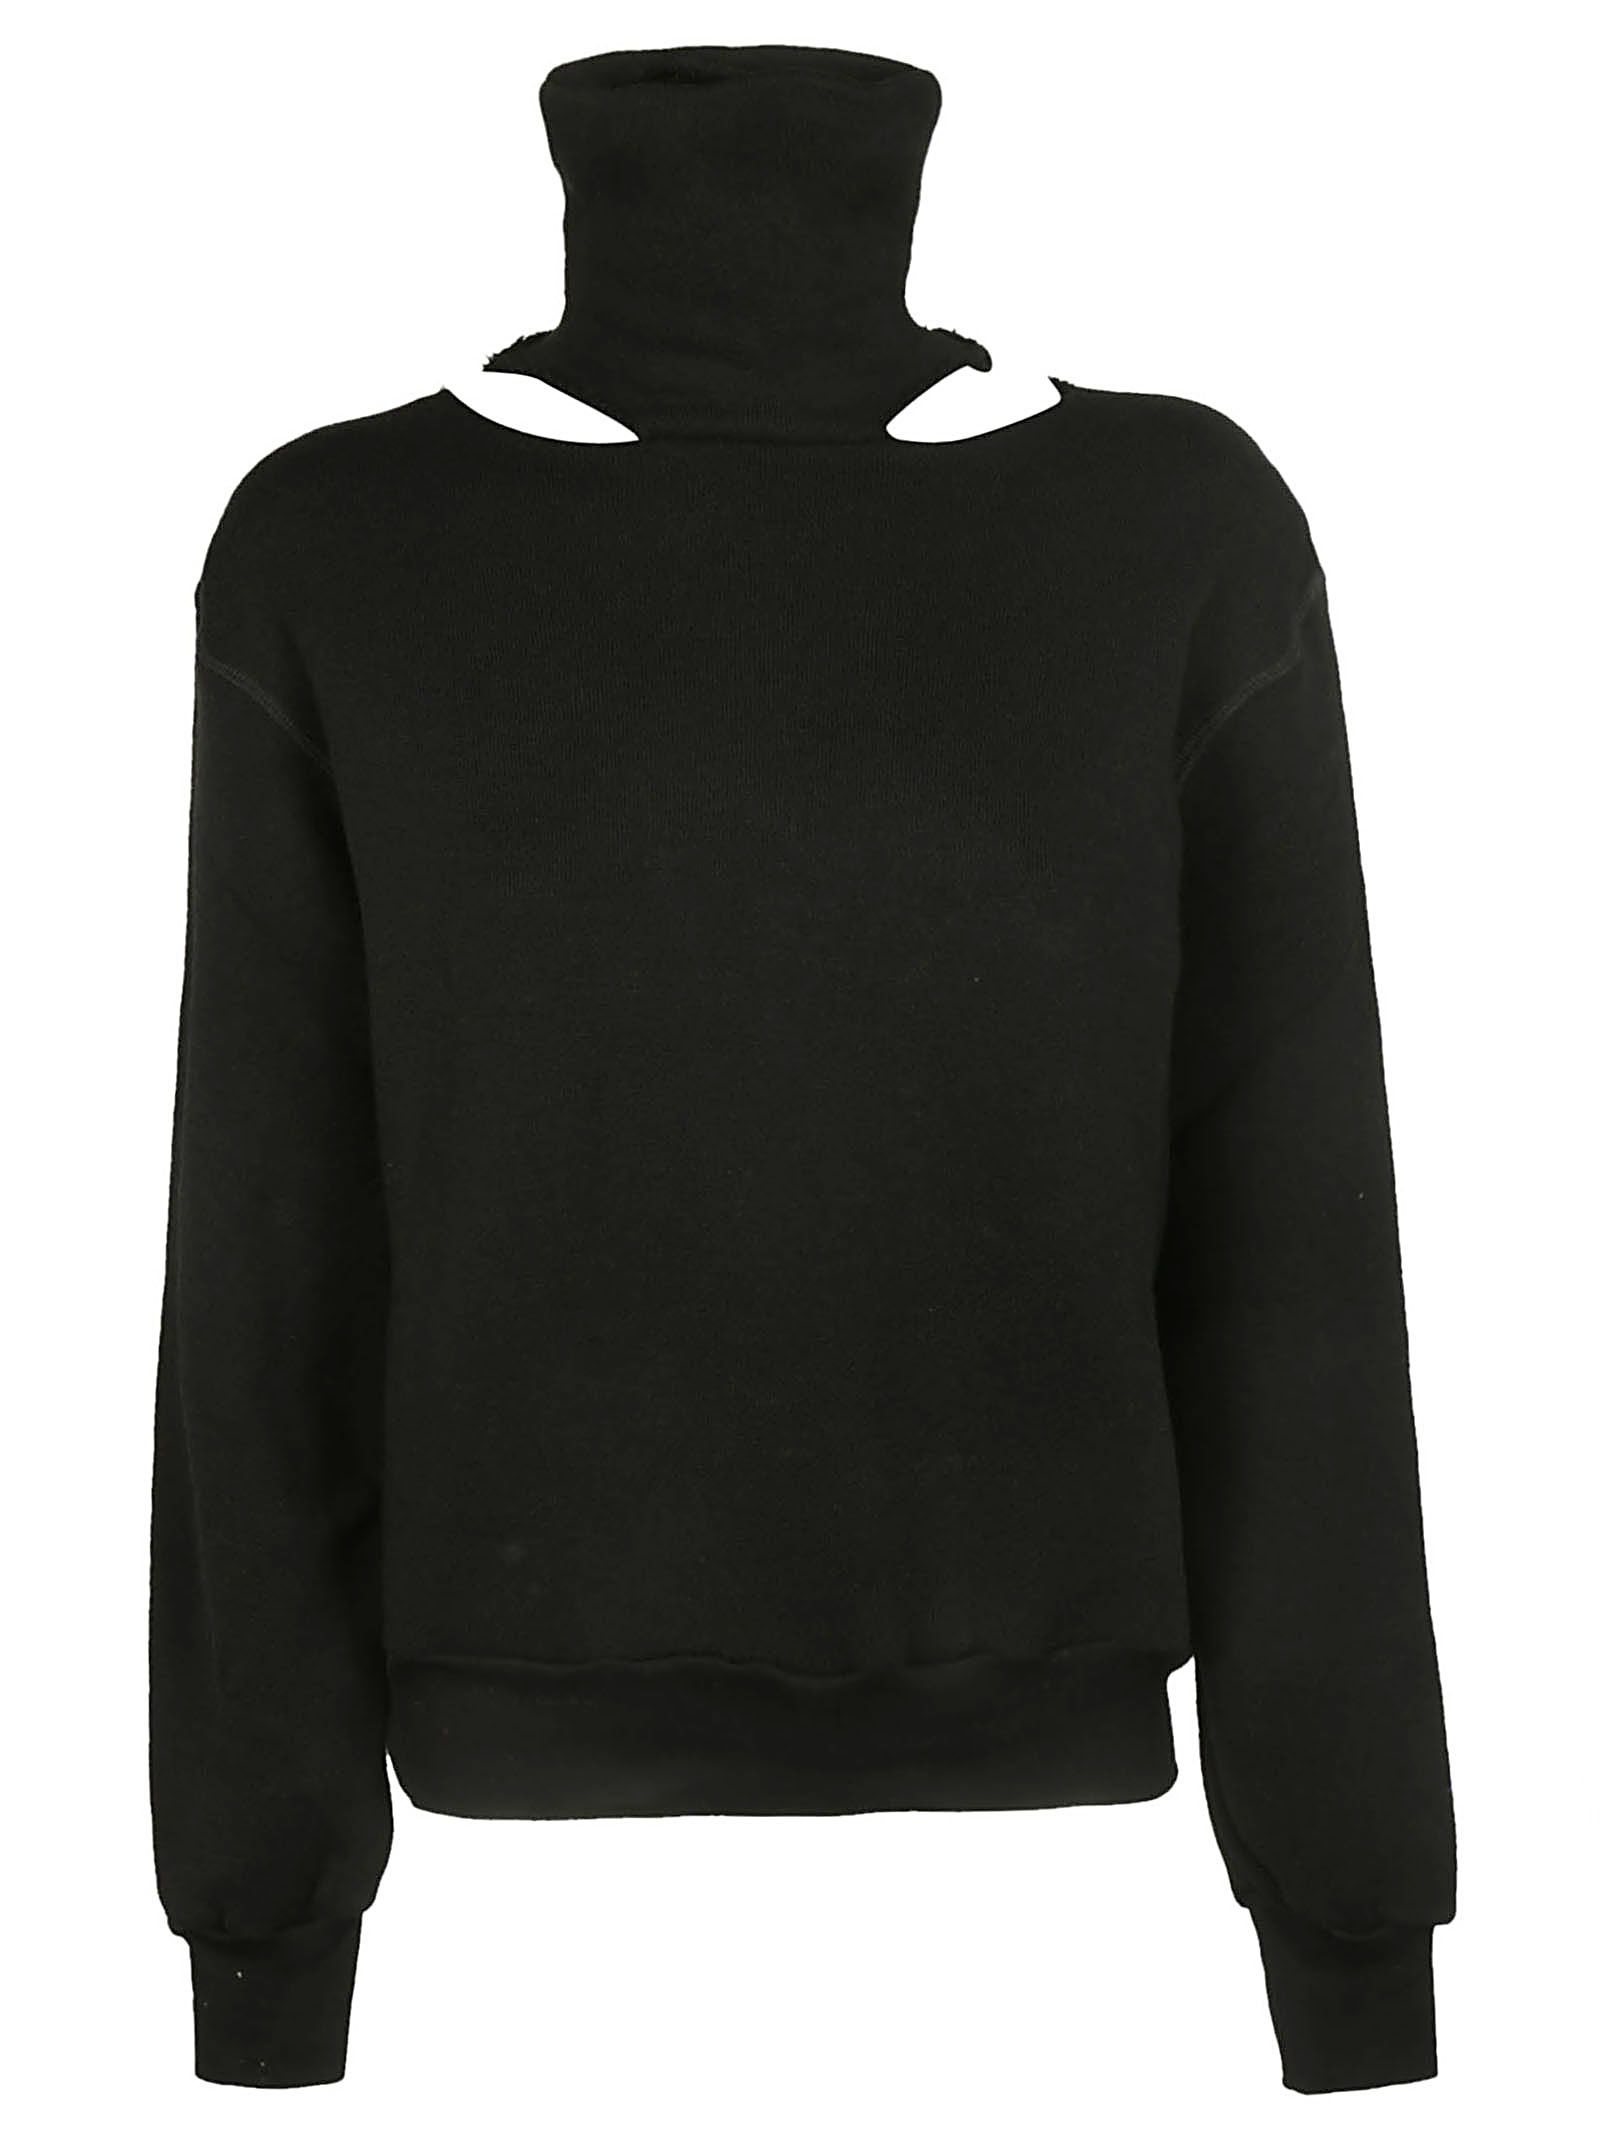 Ben Taverniti Unravel Project Turtle Neck Sweater